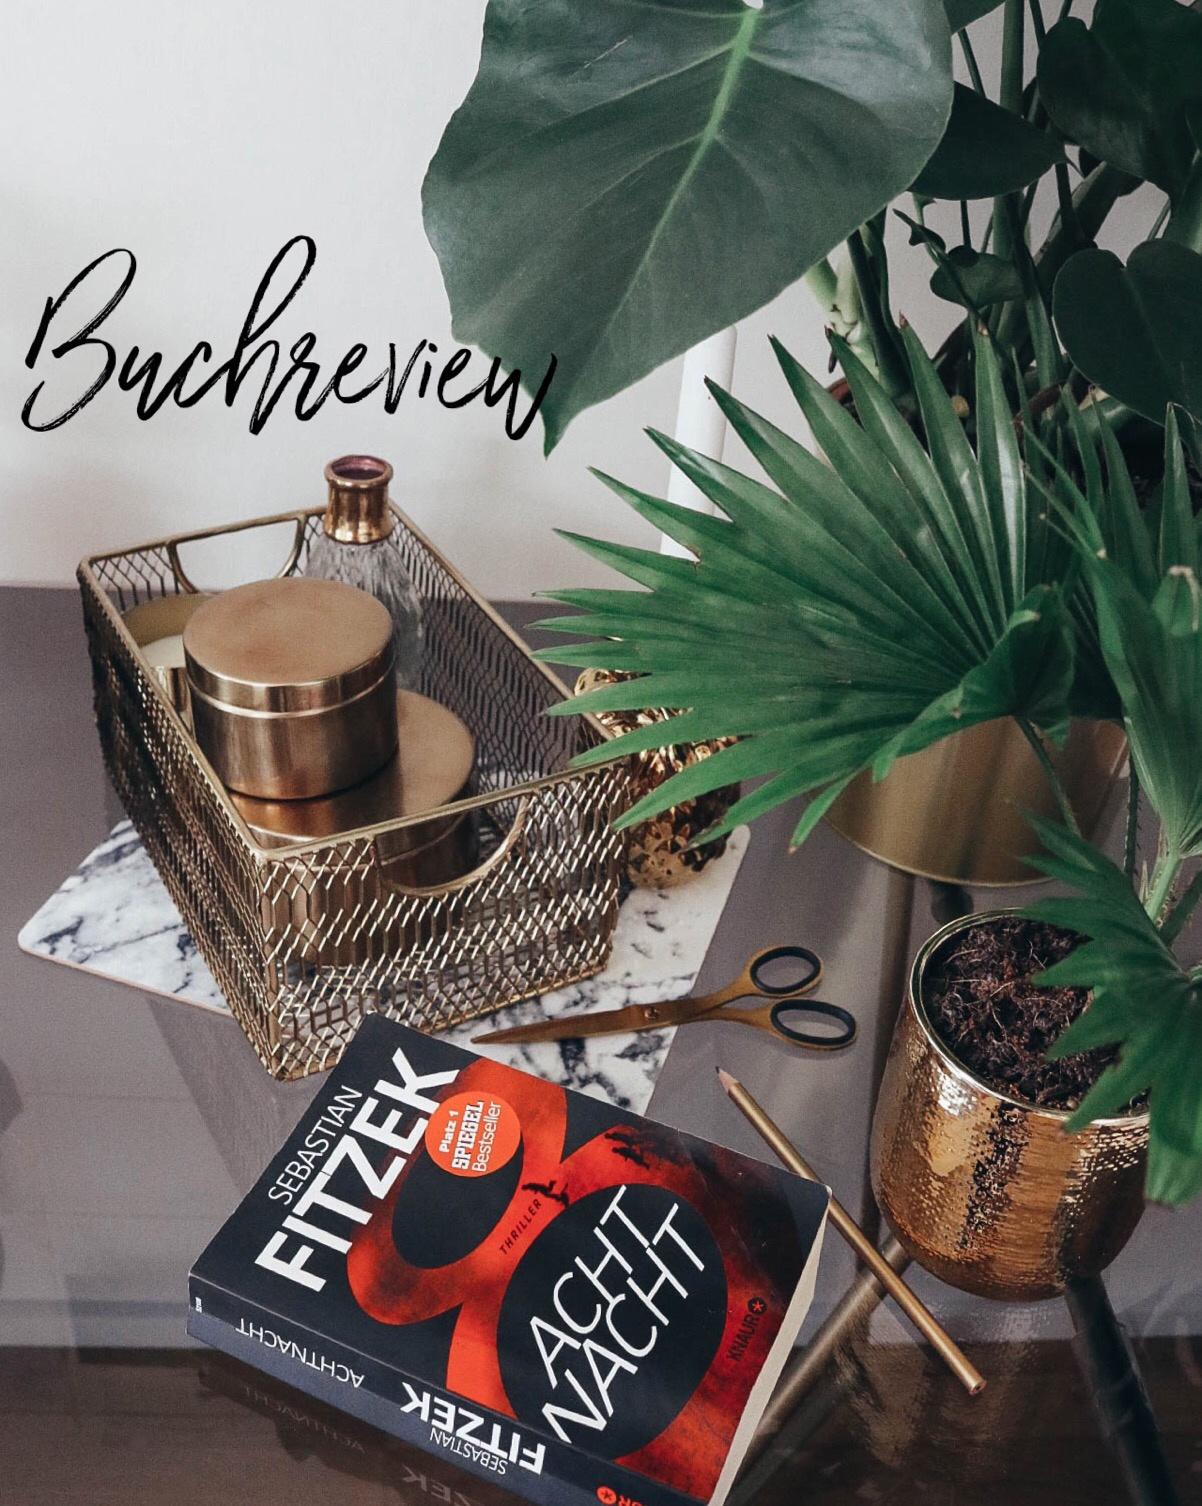 Buchreview – AchtNacht / Sebastian Fitzek